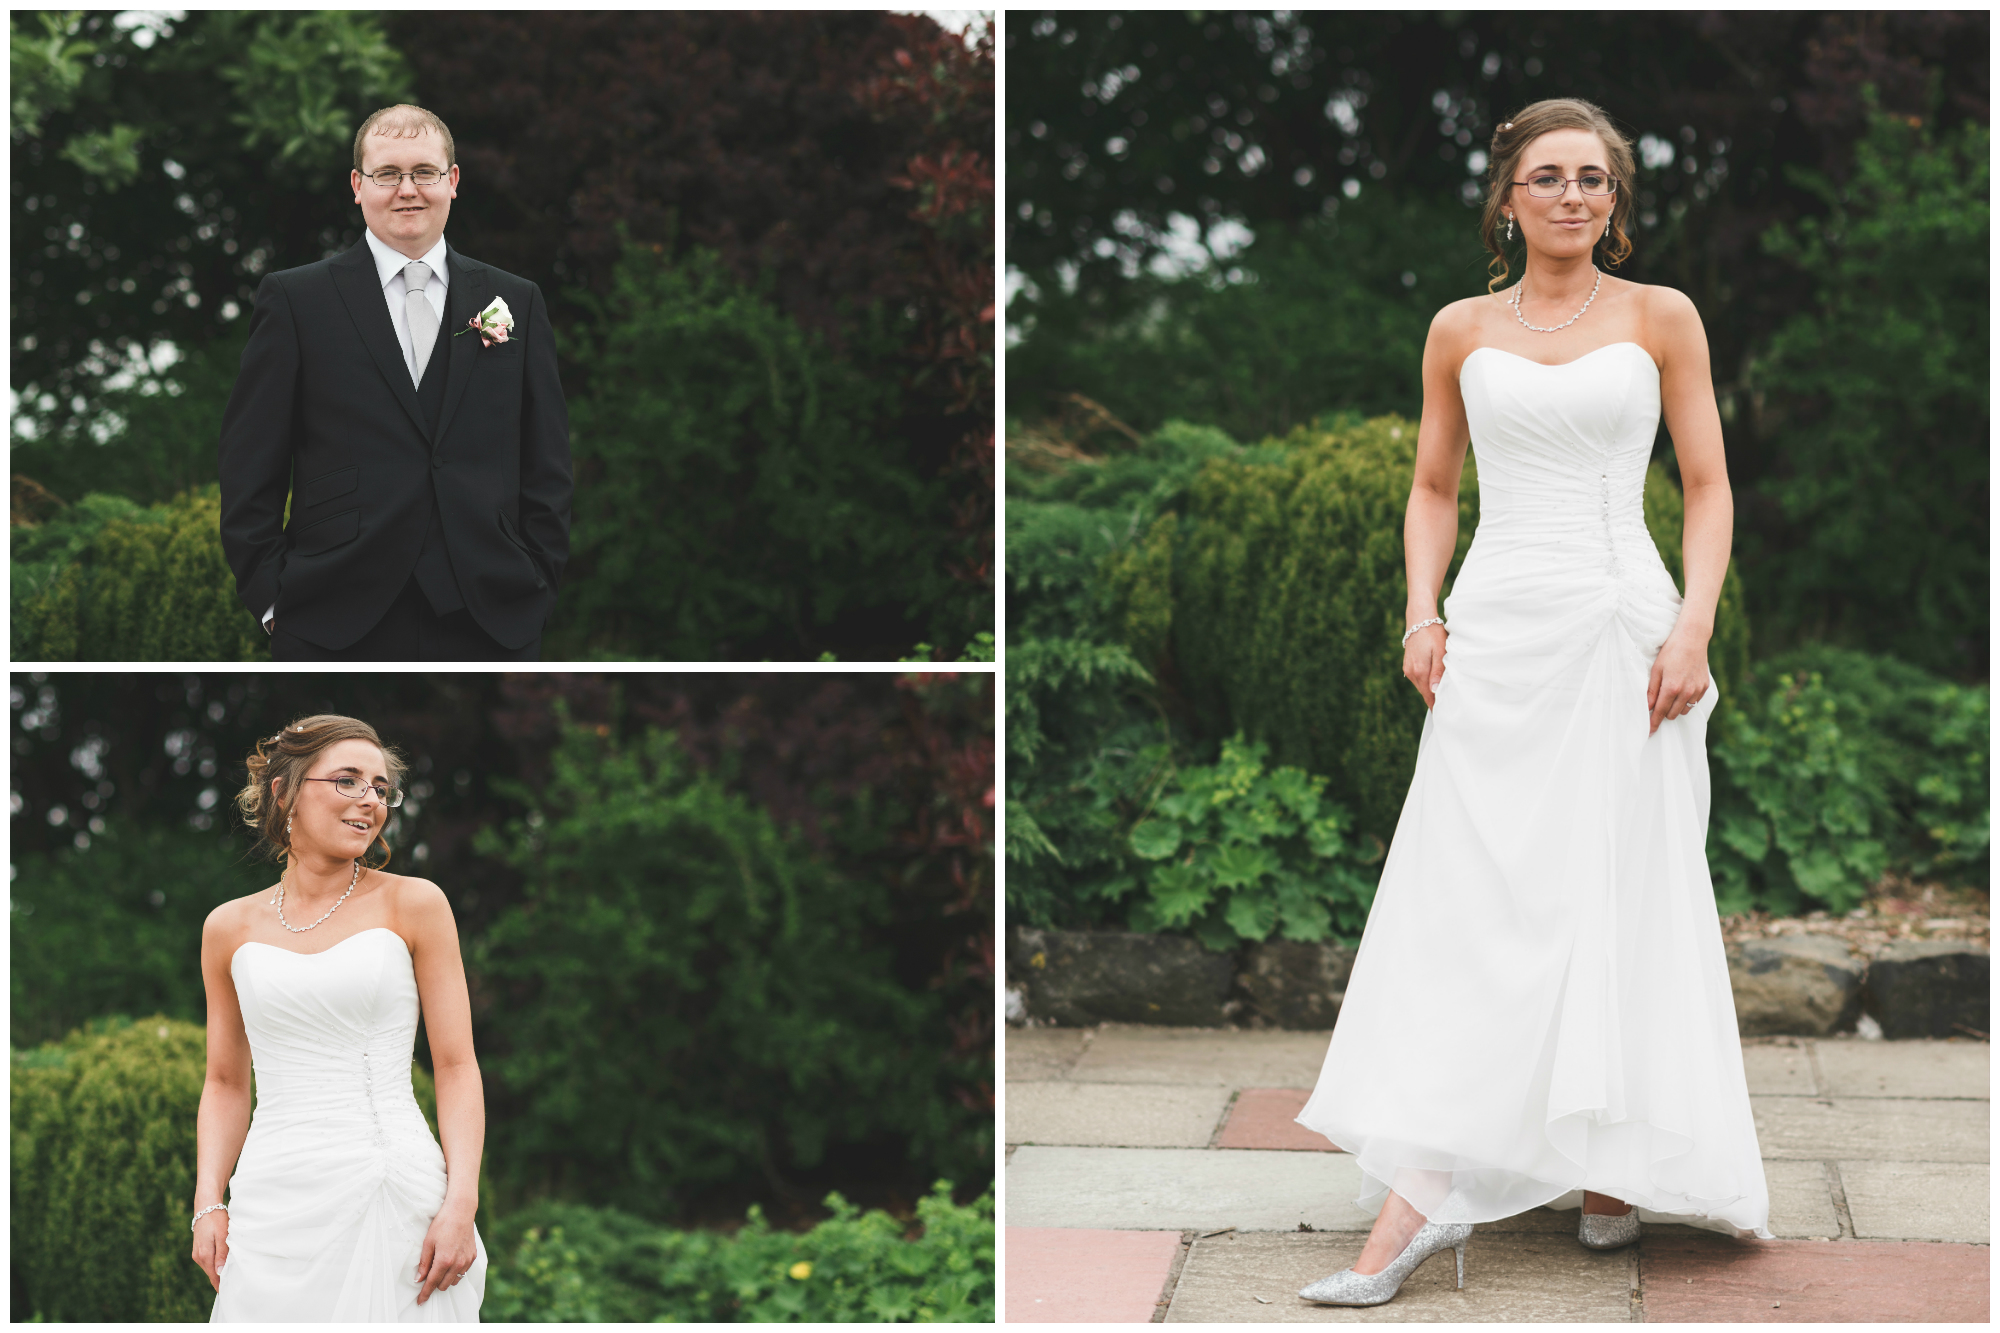 Ballymac_hotel_wedding_lisburn_bride_and_groom_married